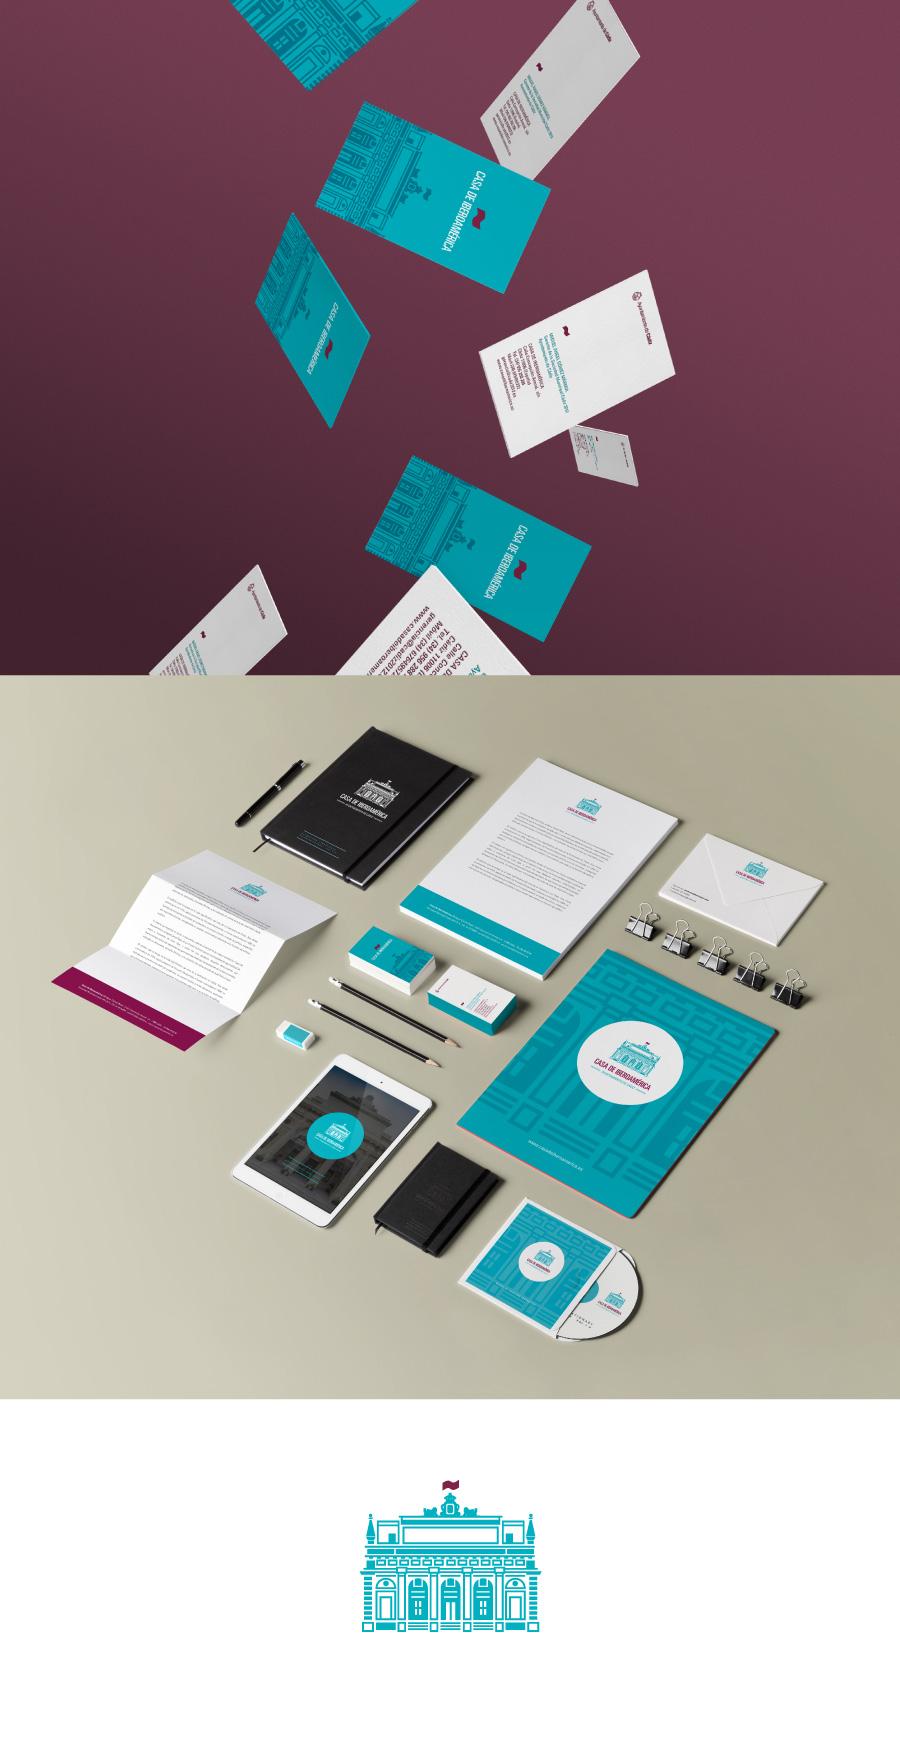 Diseño gráfico y branding cádiz